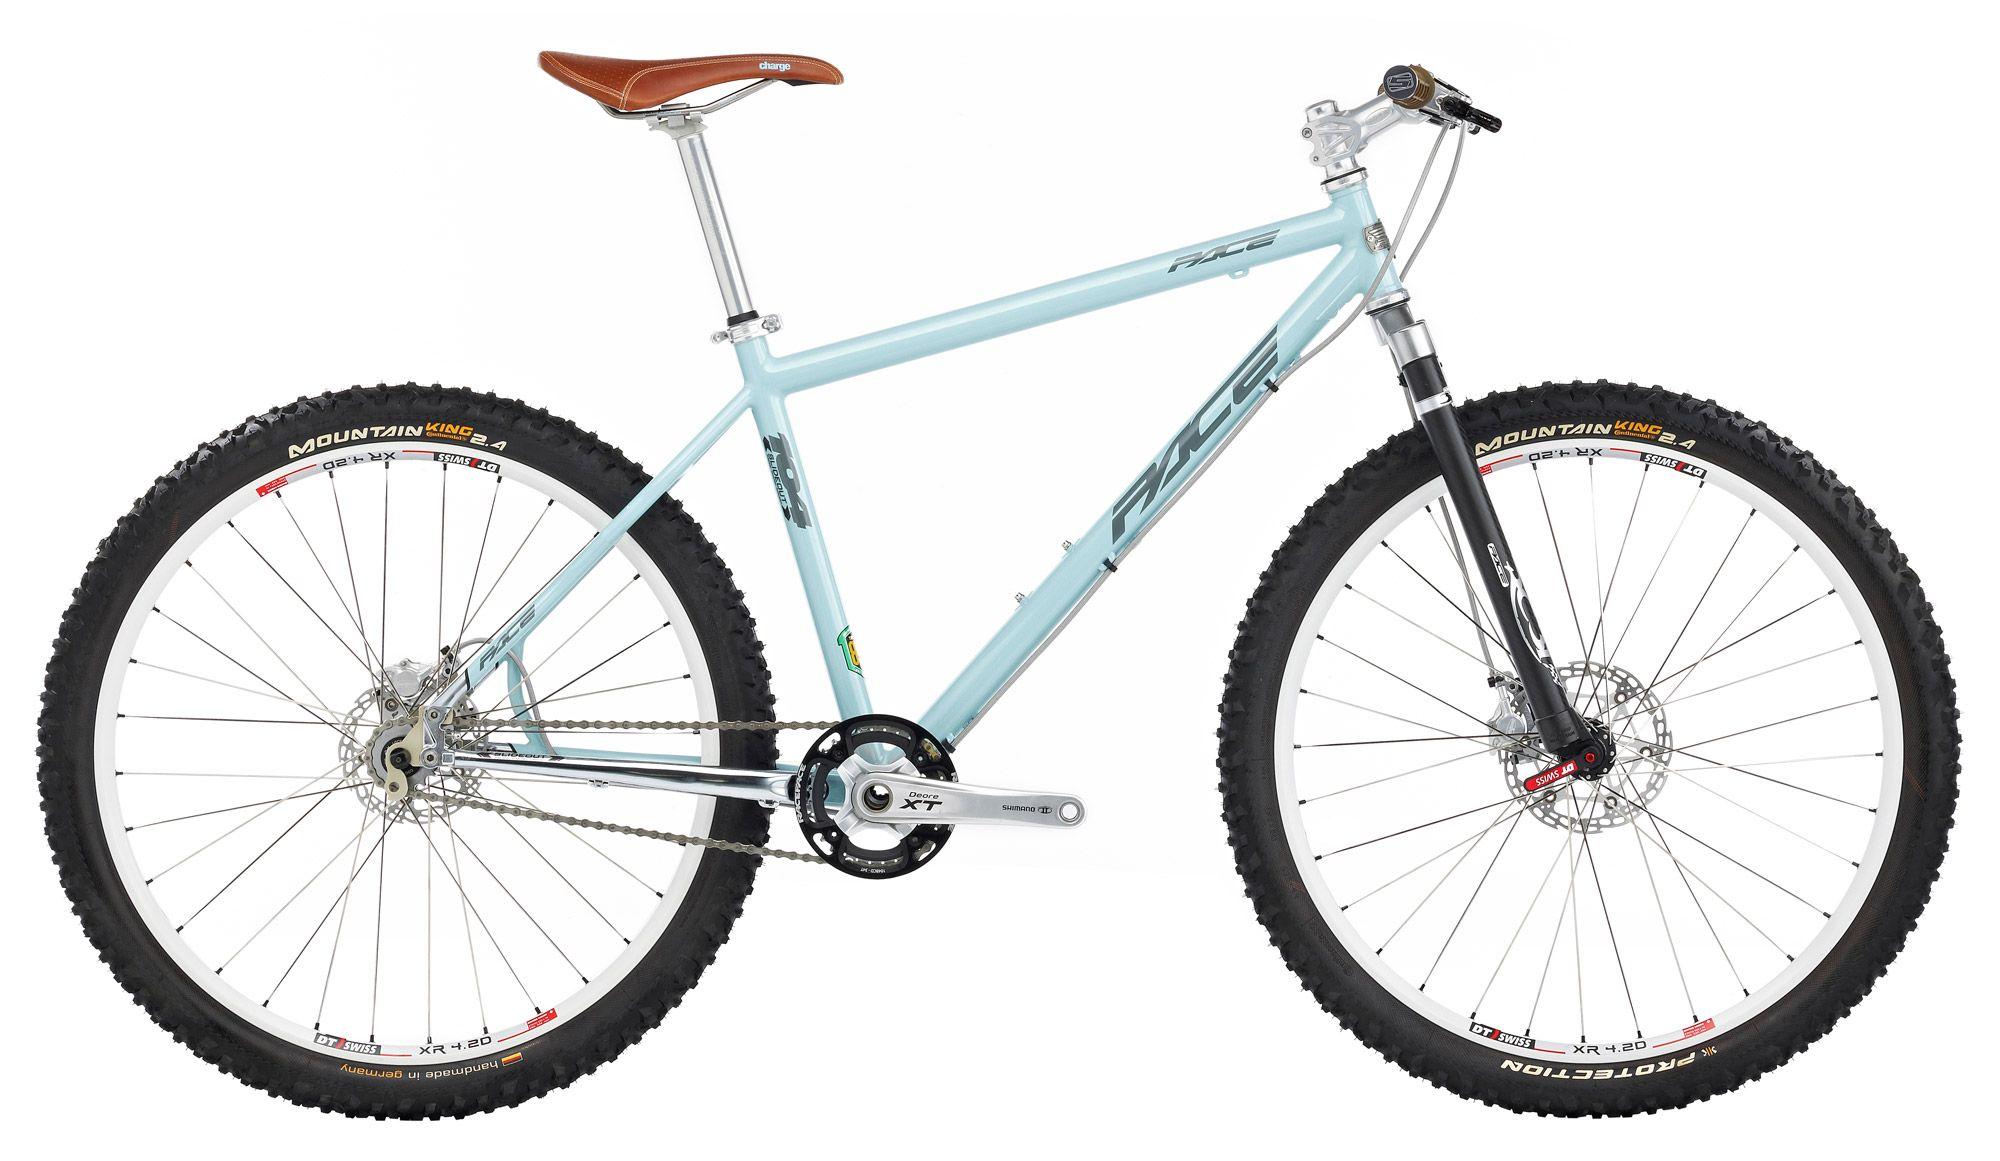 Rc104 Pace Cycles Ltd Bike Frame Hardtail Mountain Bike Cycle